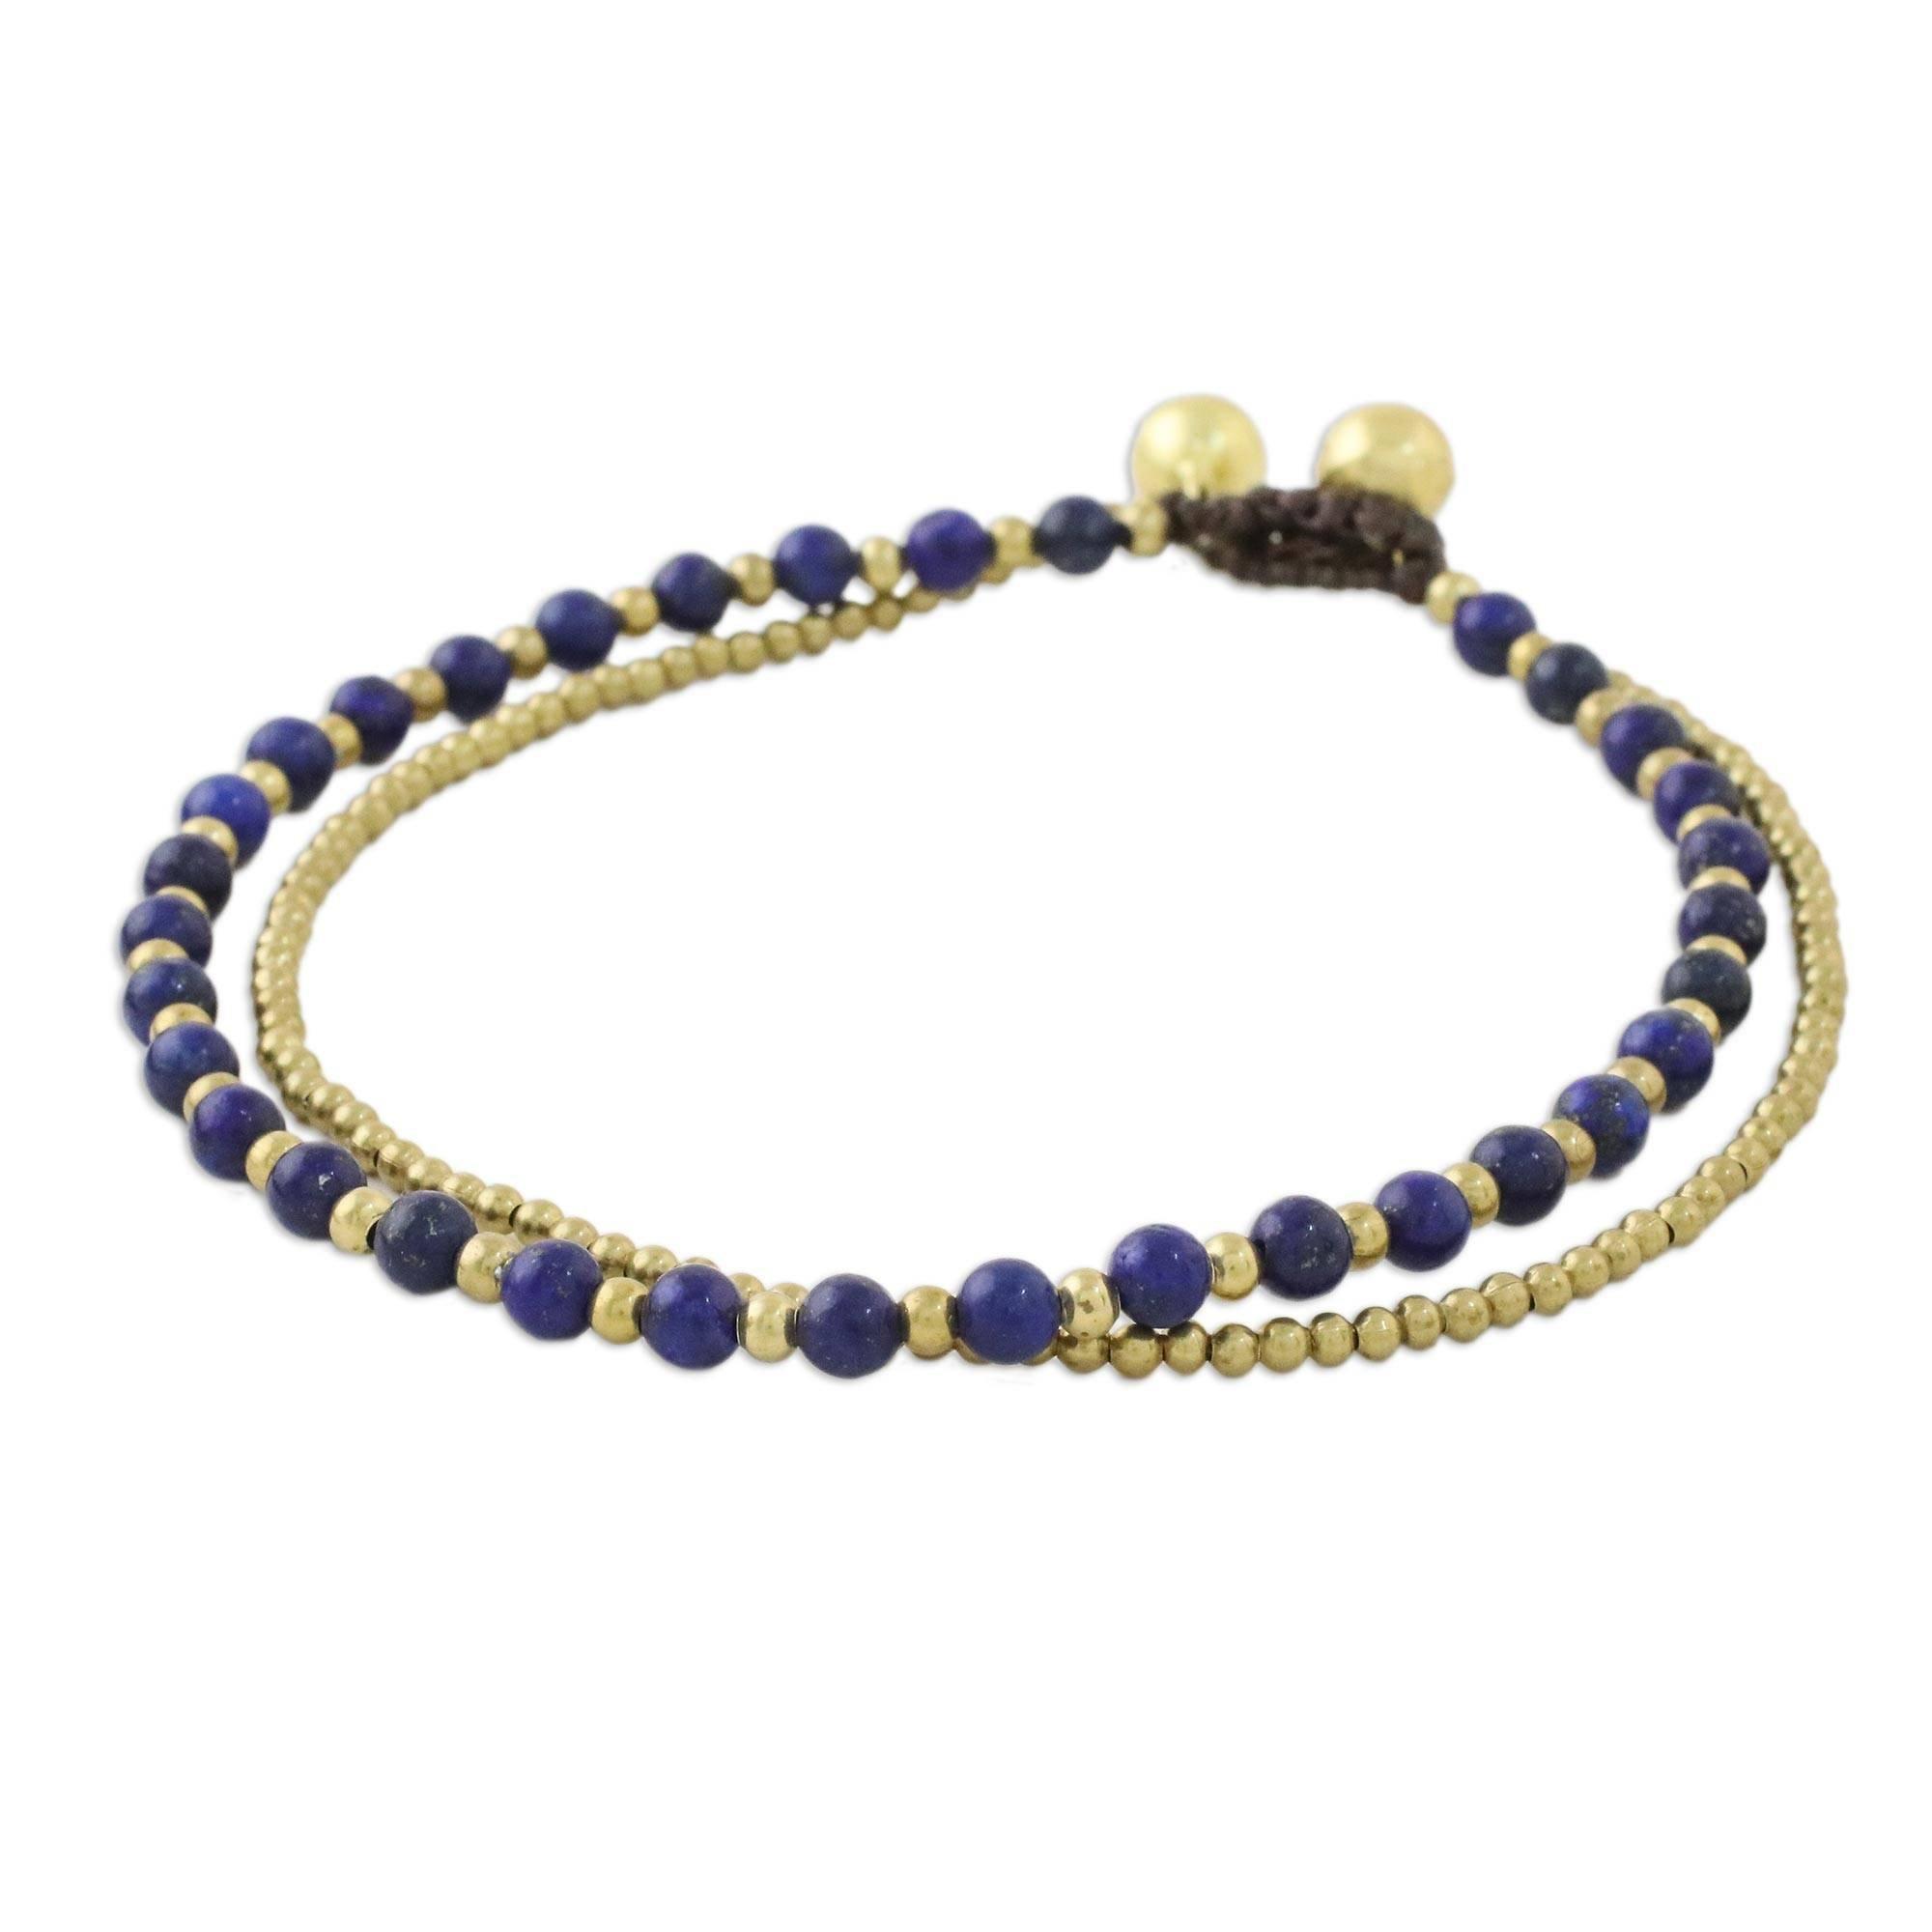 NOVICA Lapis Lazuli Brass Beaded Anklet, 9.25'' 'Ringing Beauty'